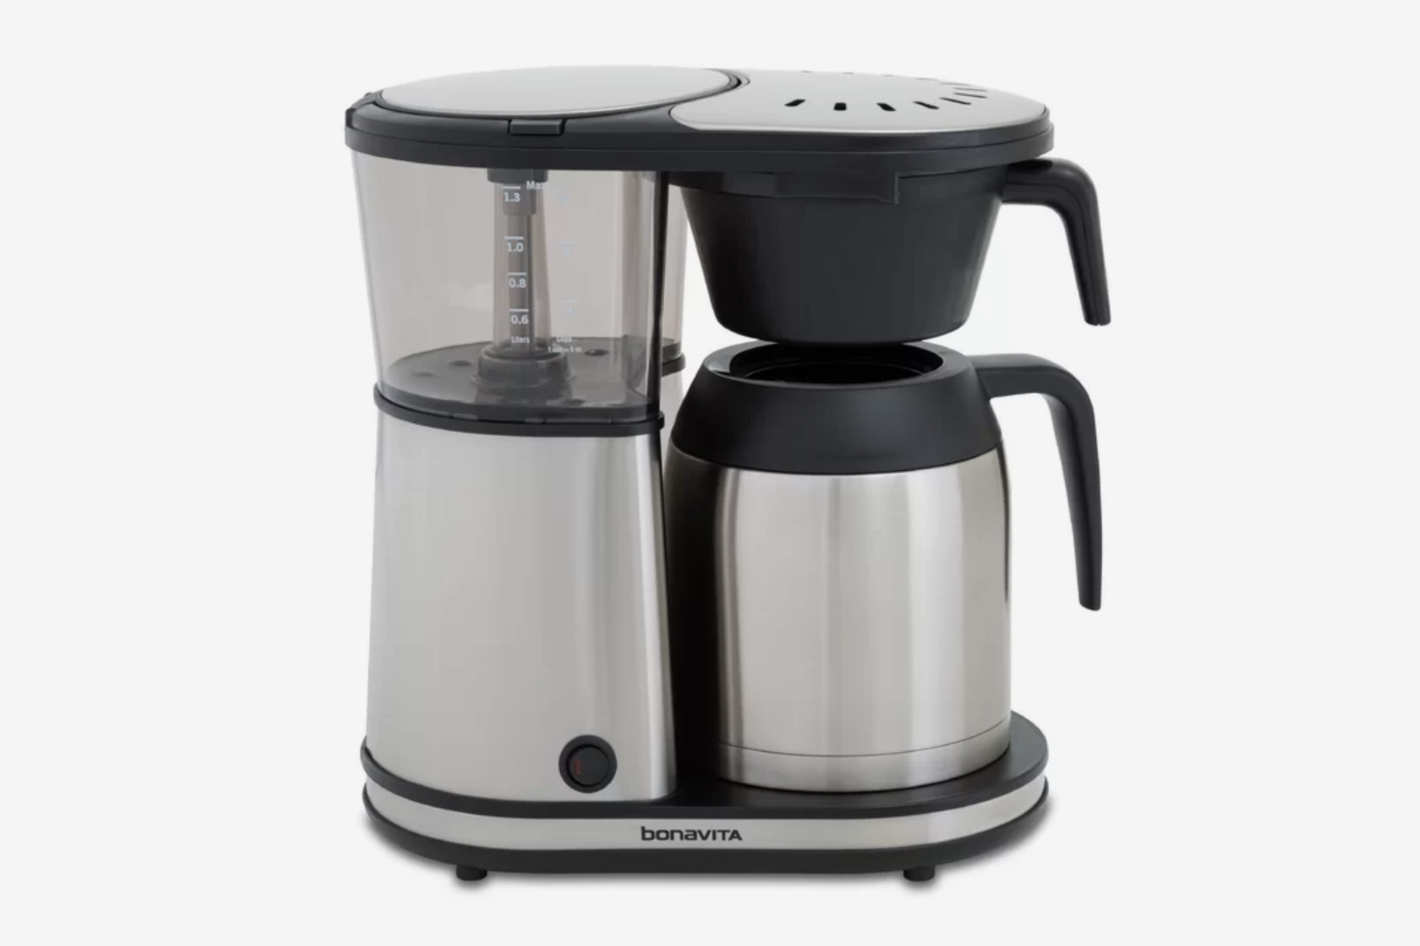 Bonavita Carafe 8 Cup Coffee Maker